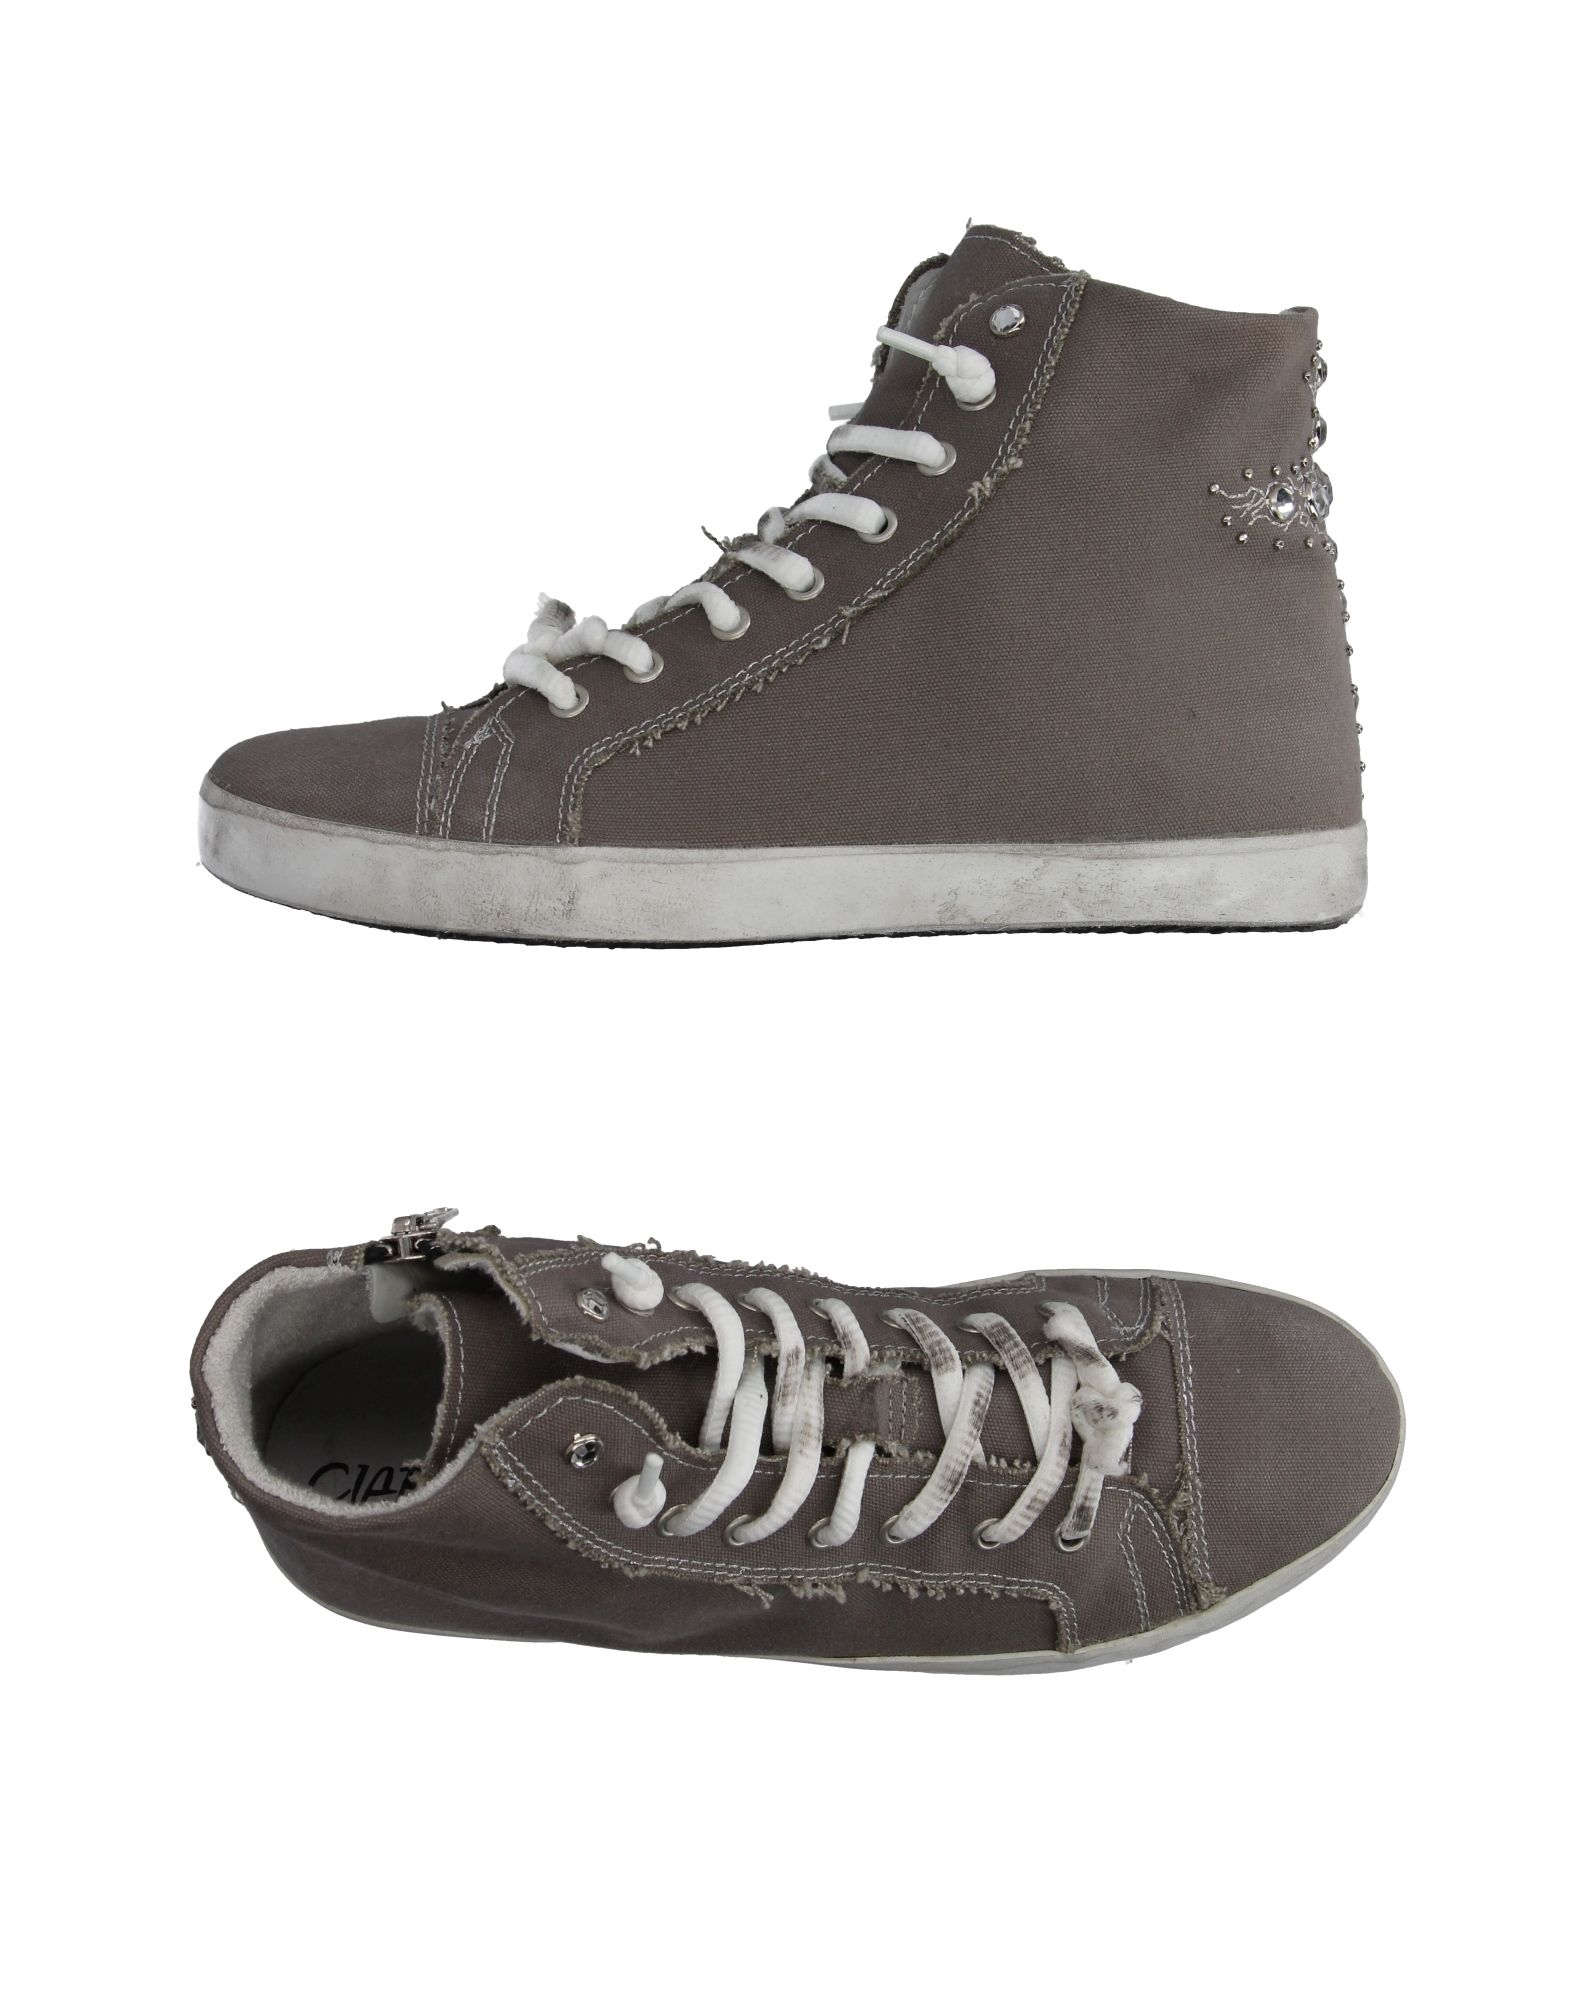 CIABOO Высокие кеды и кроссовки кеды кроссовки высокие dc council mid tx stone camo